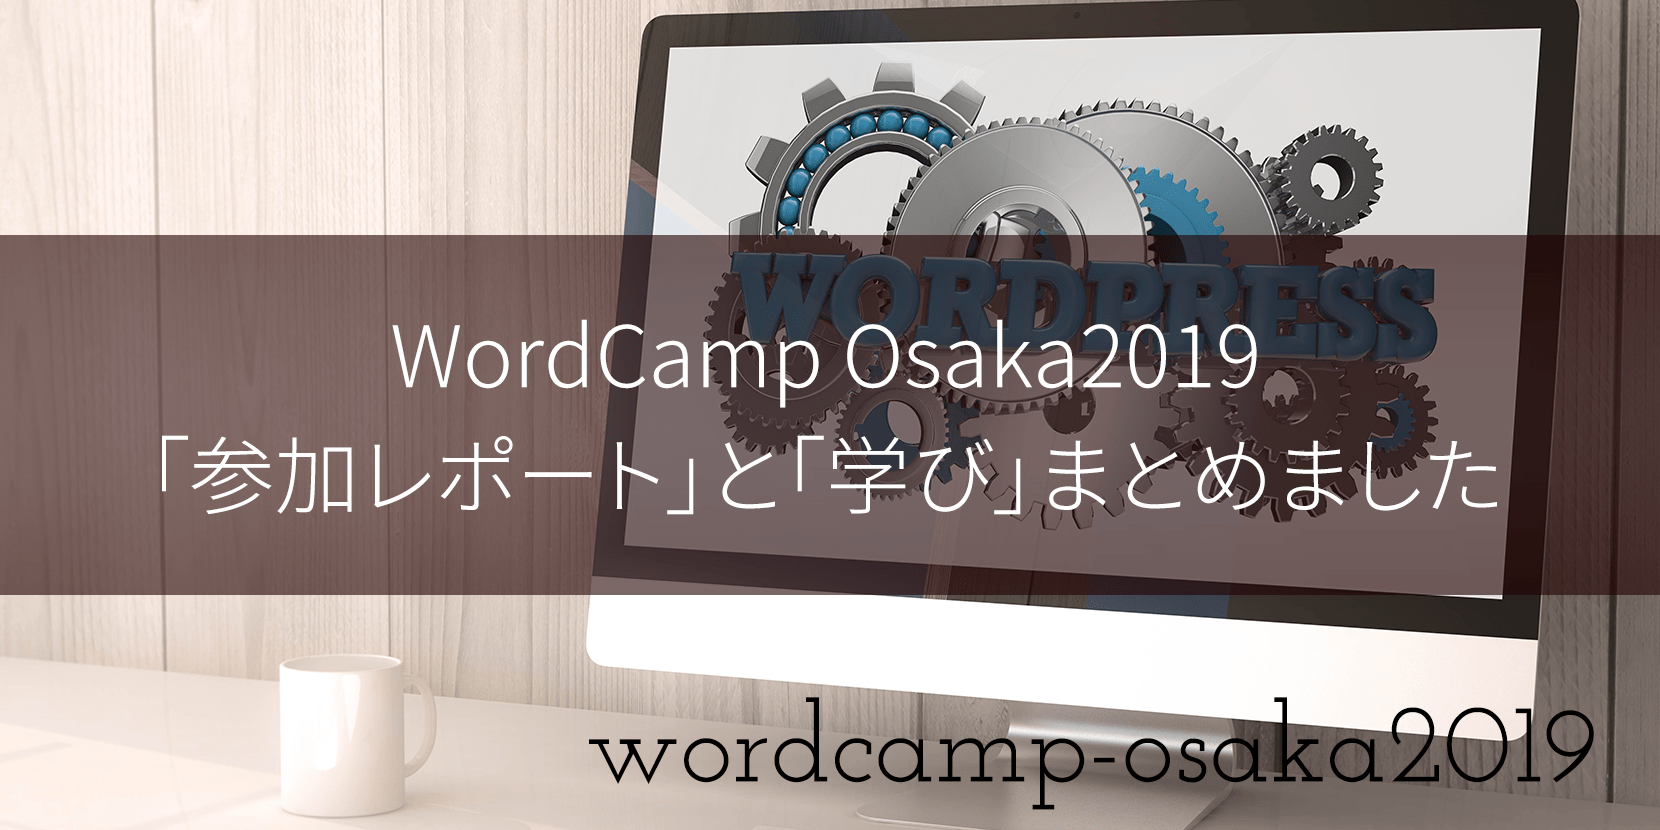 WordCamp Osaka2019 「参加レポート」と「学び」まとめました